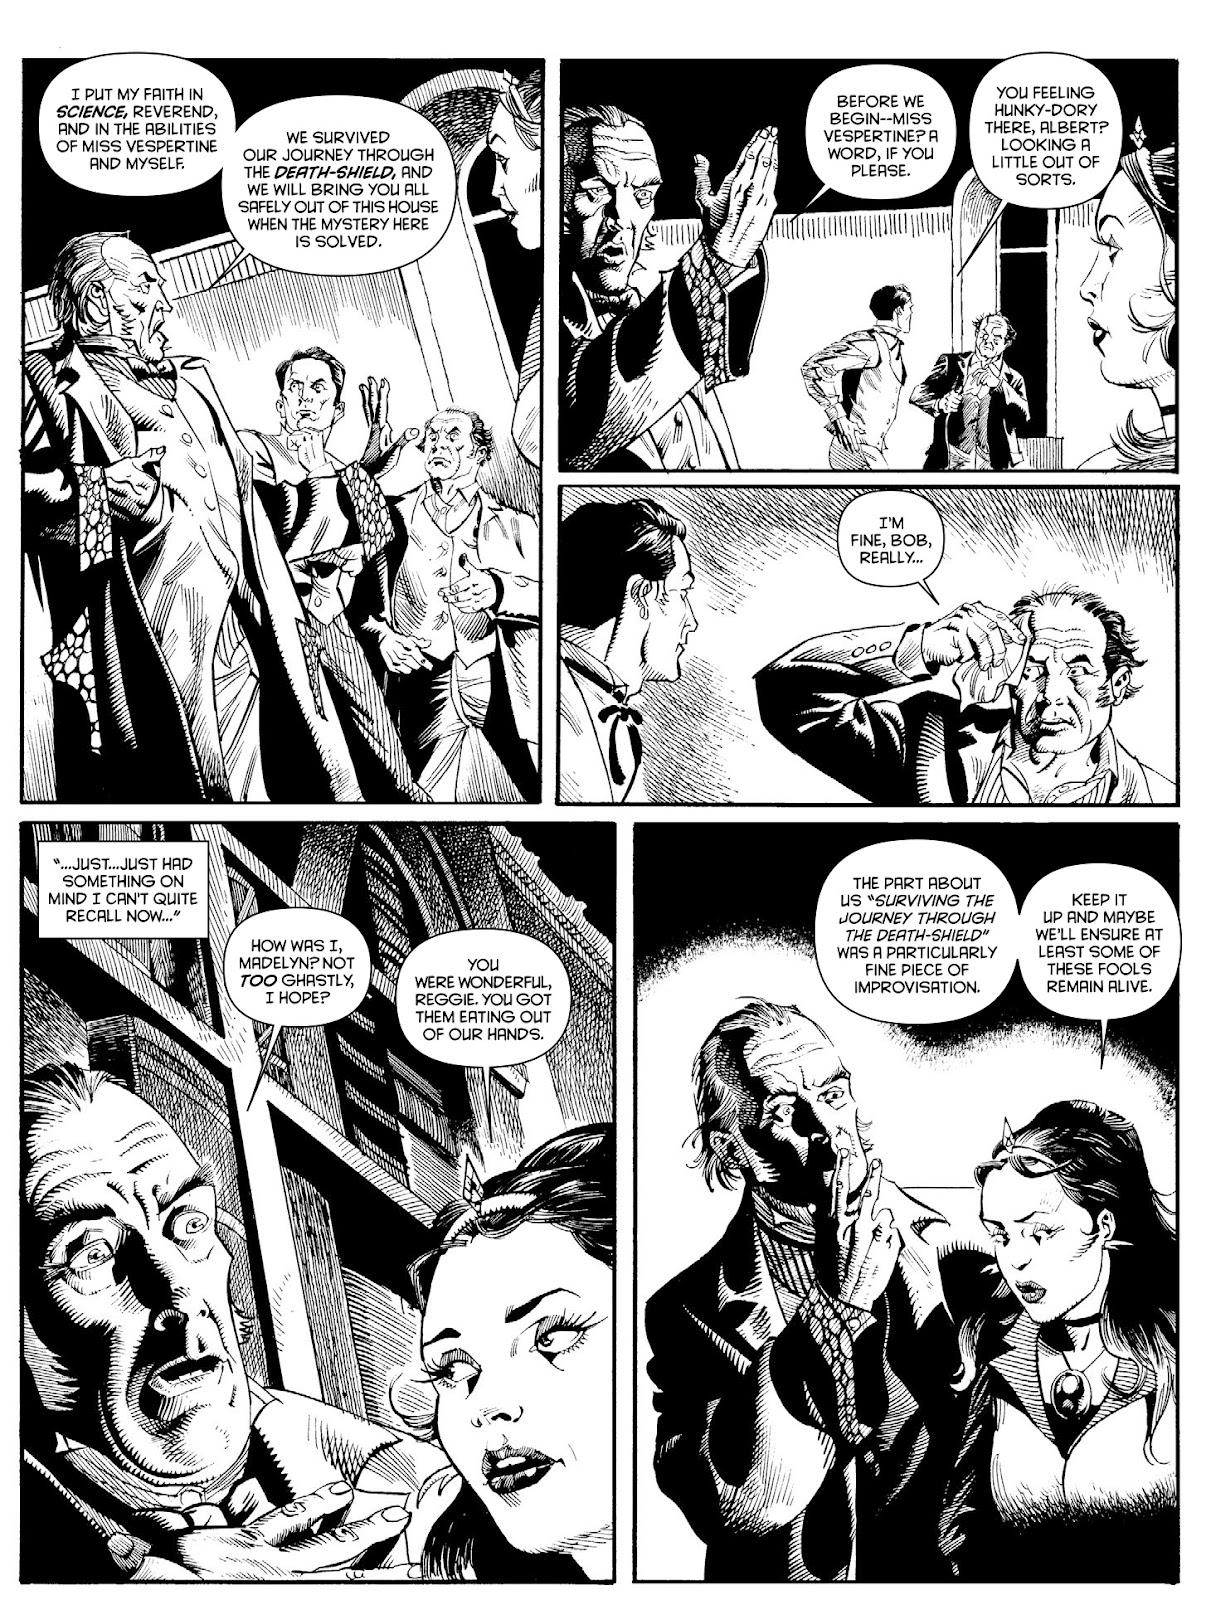 Judge Dredd Megazine (Vol. 5) issue 427 - Page 87